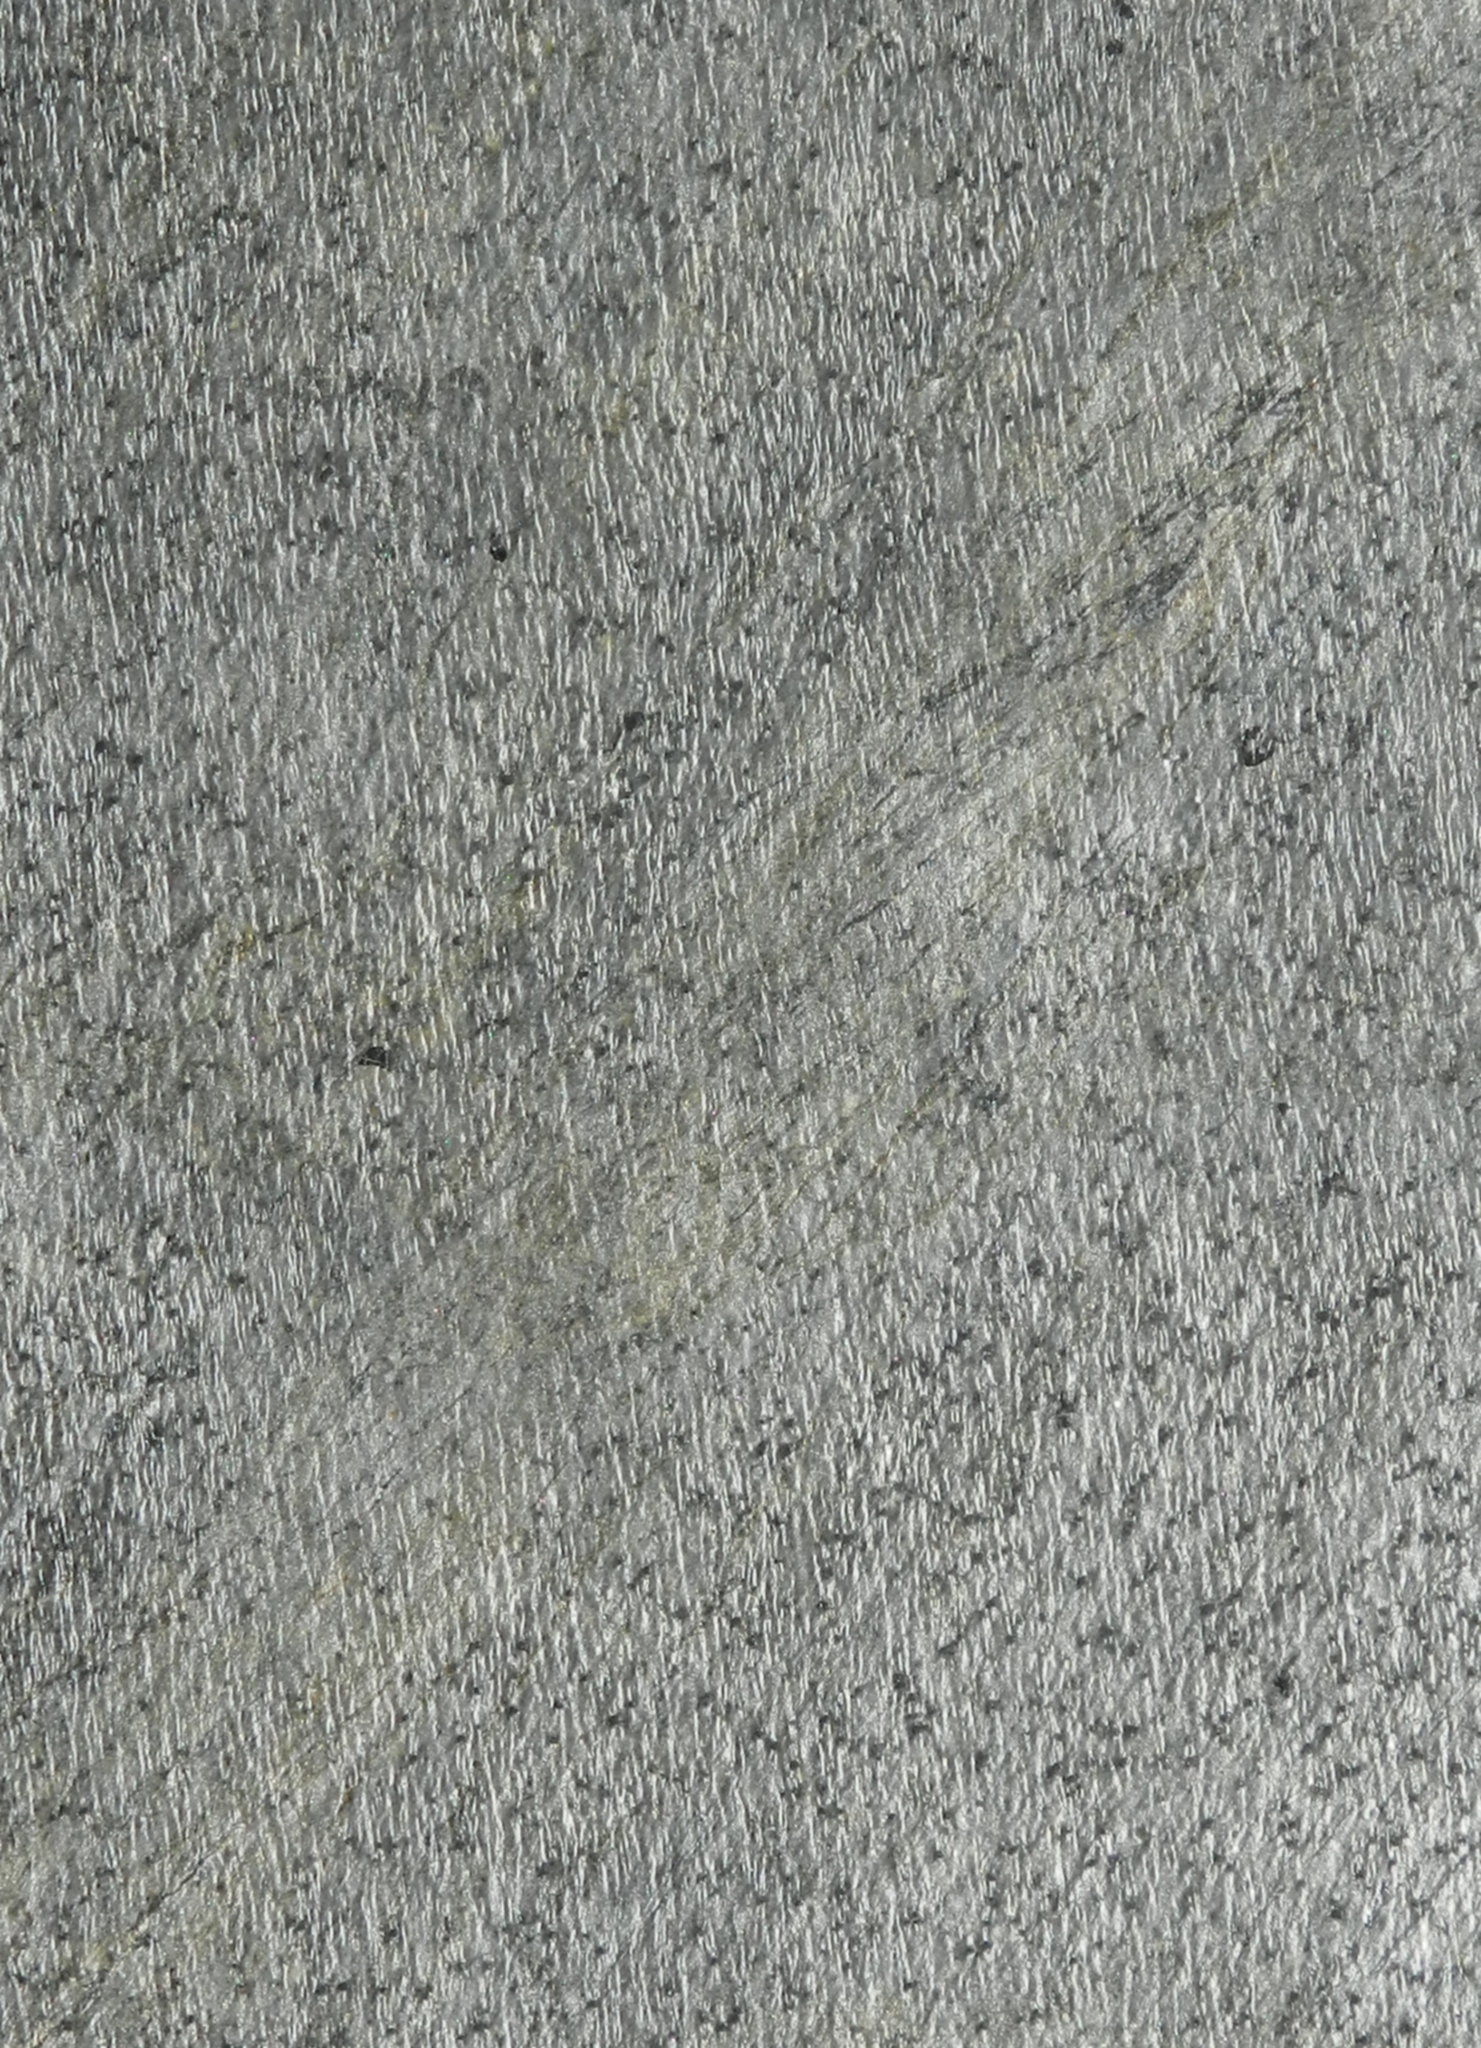 9016 Sparcled Granite